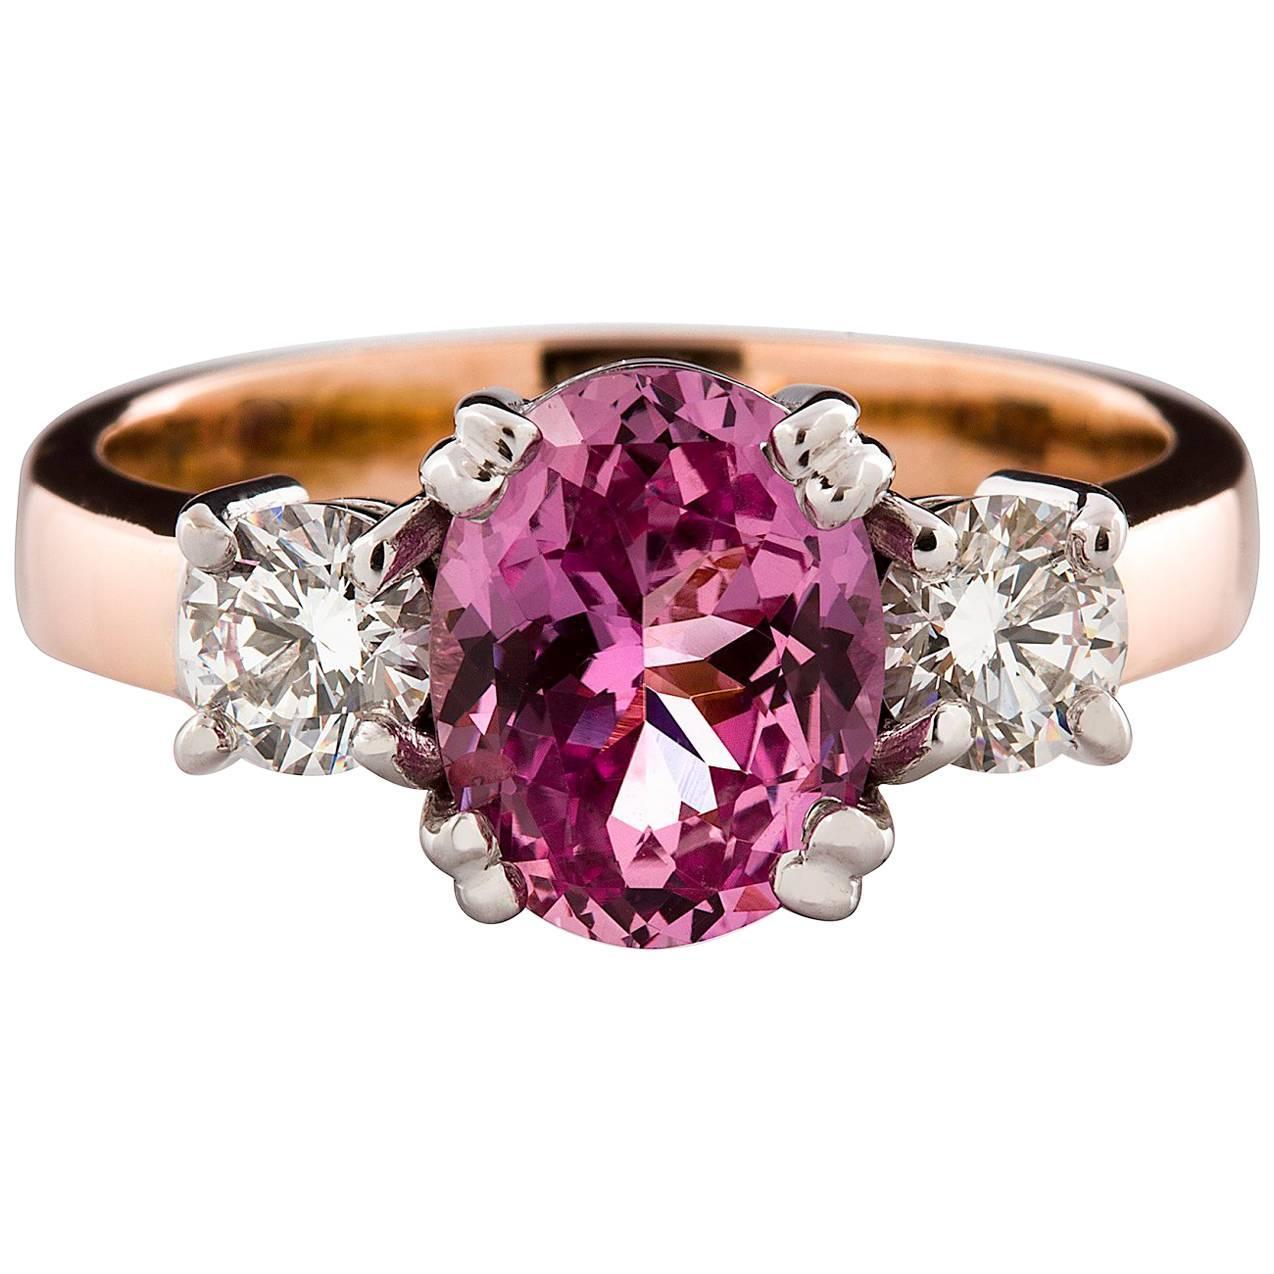 Kian Design 18 Carat Three Stones Certified Oval Pink Sapphire and Diamond Ring